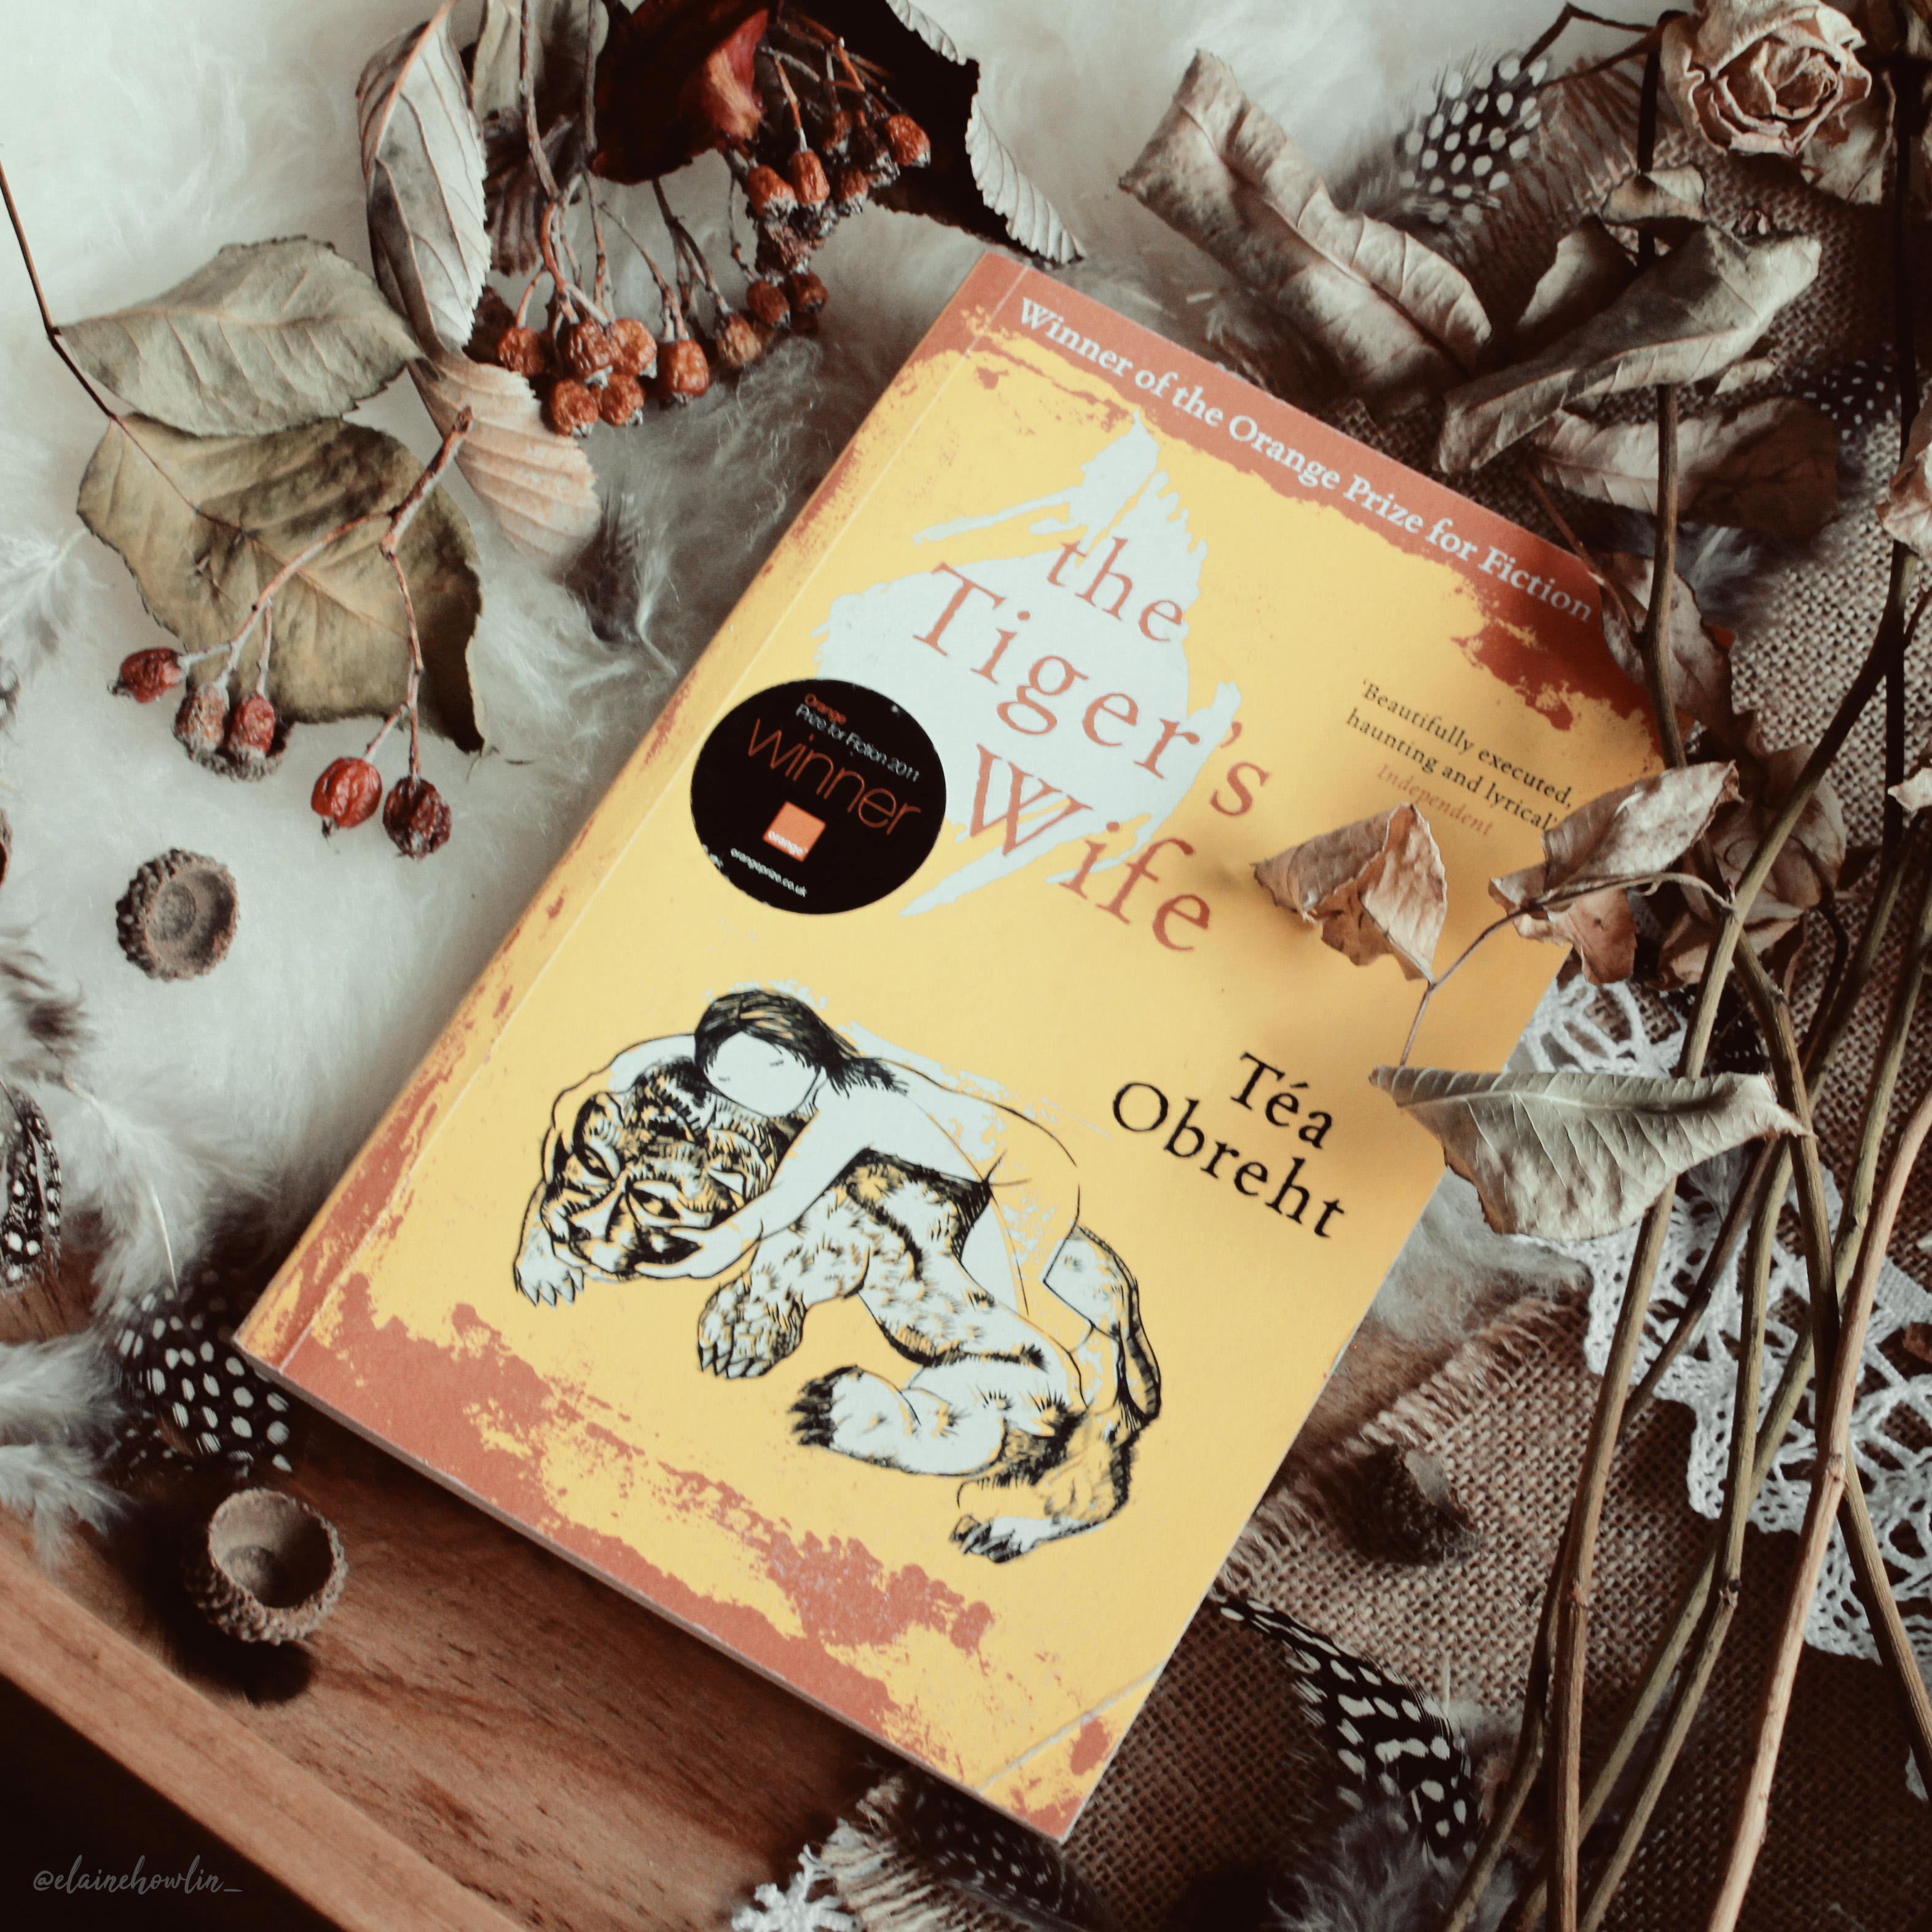 The Tiger's Wife by Tea Obreht Elaine Howlin Literary Blog